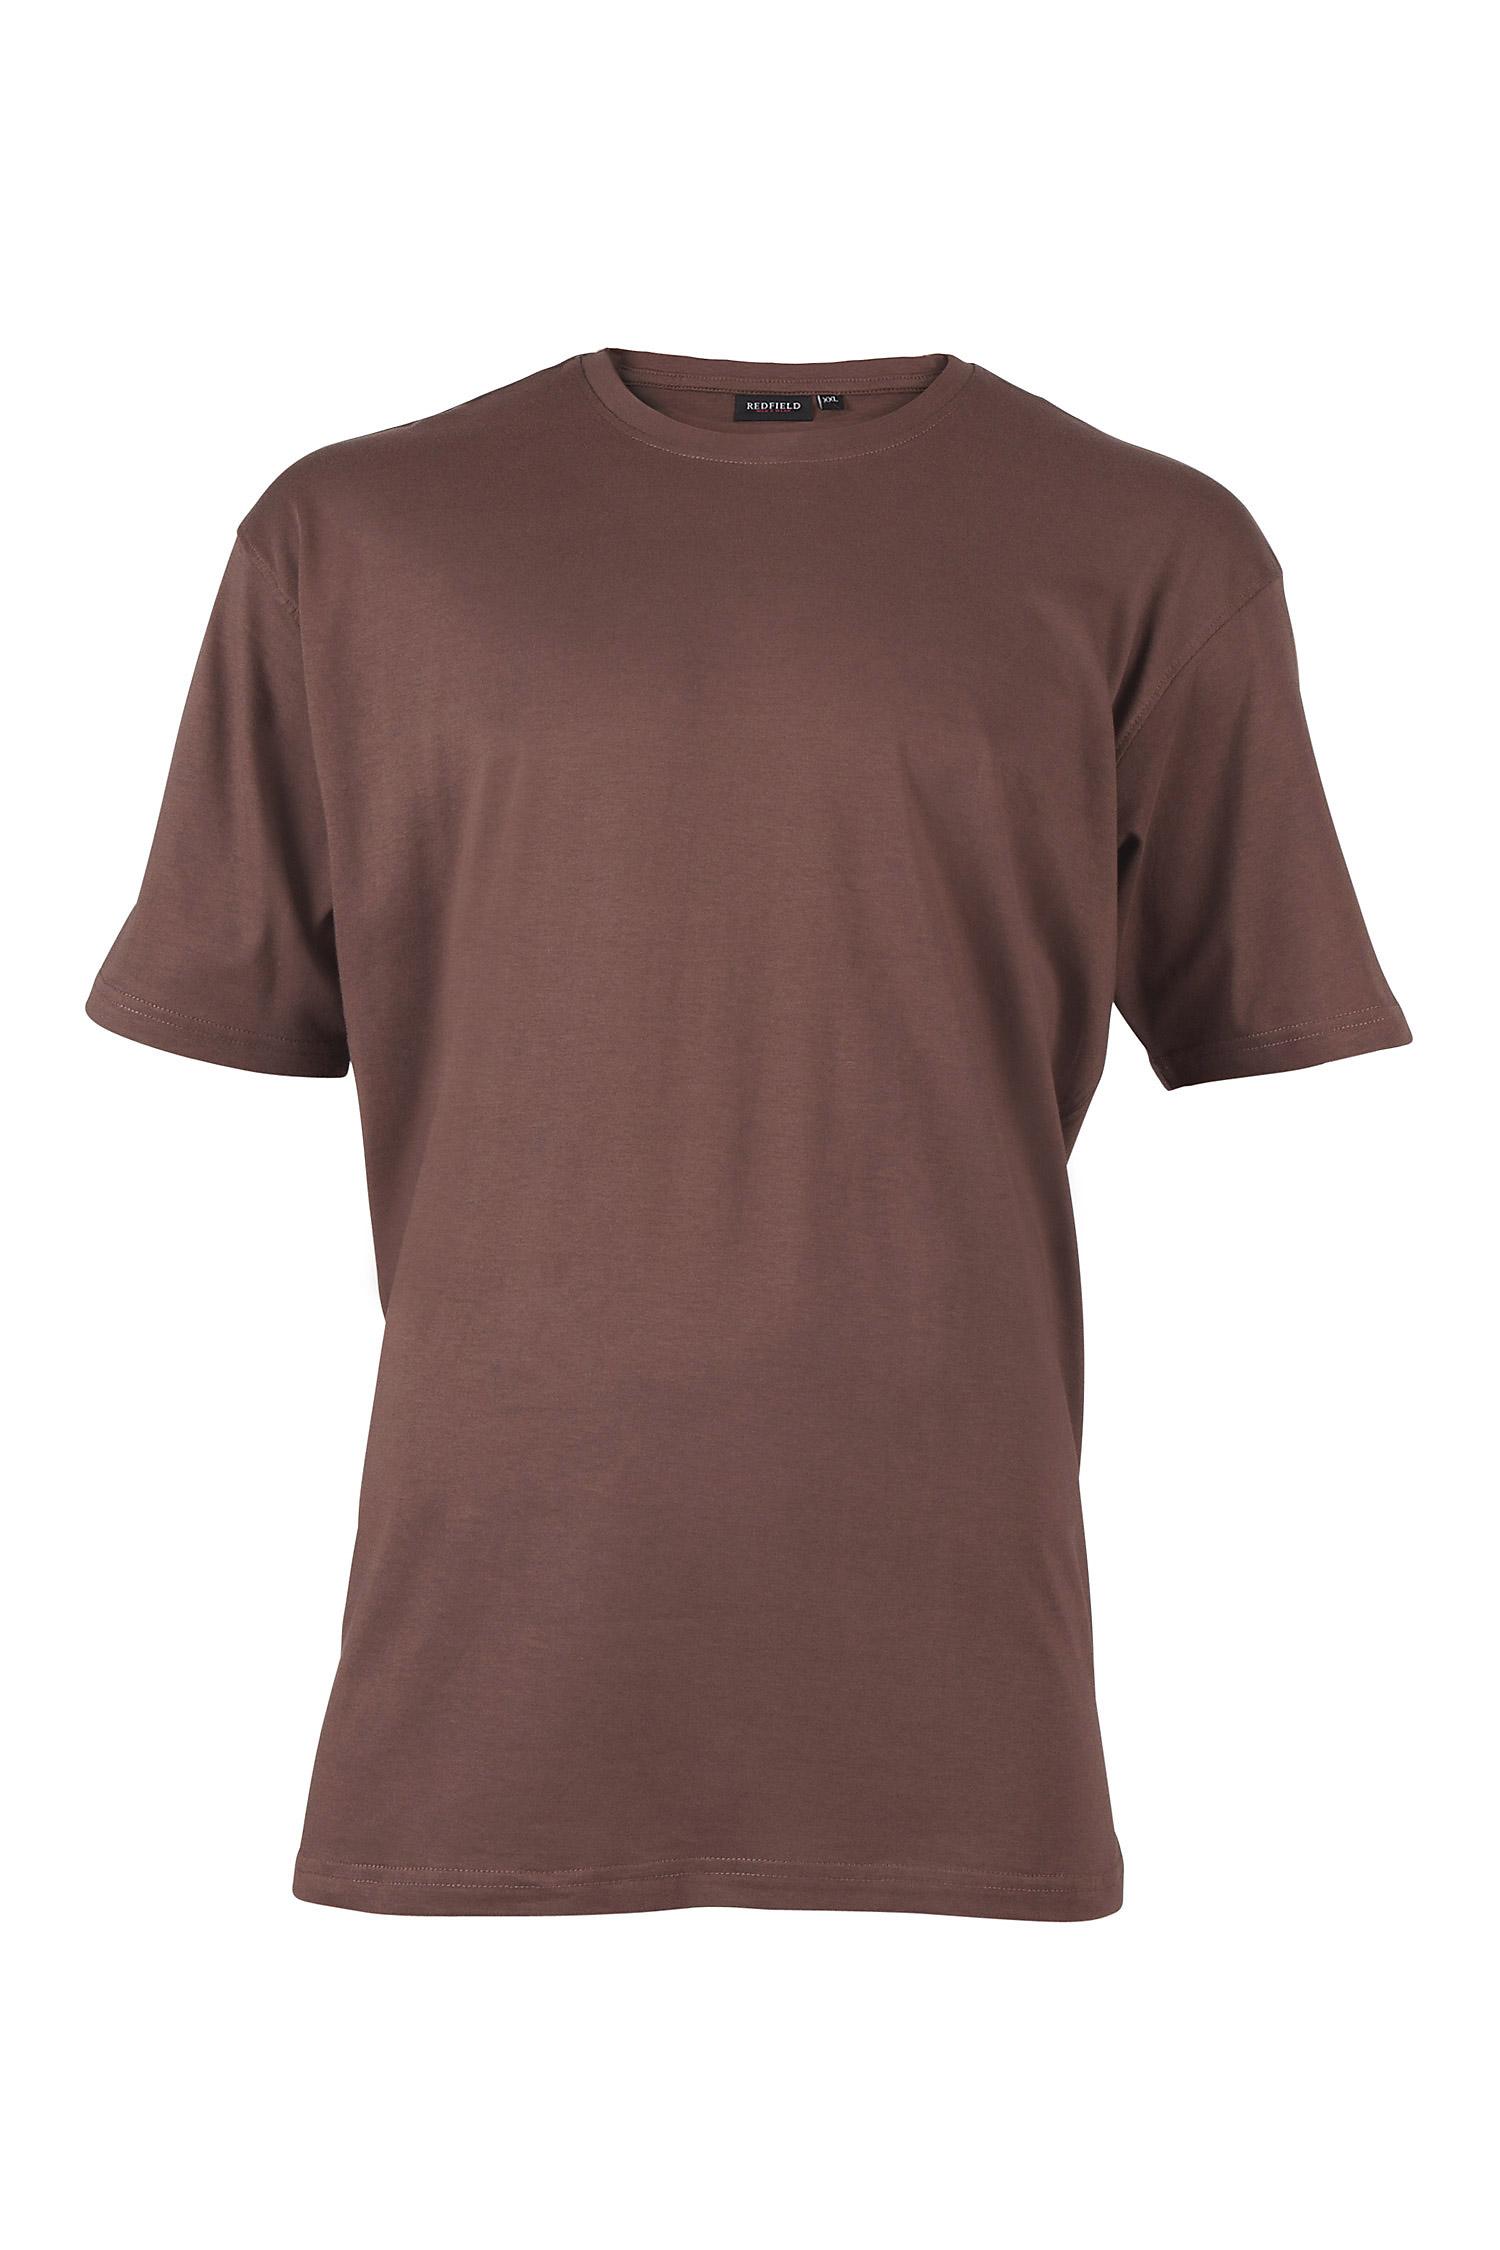 Sport, Camisetas M. Corta, 107495, MARRON | Zoom